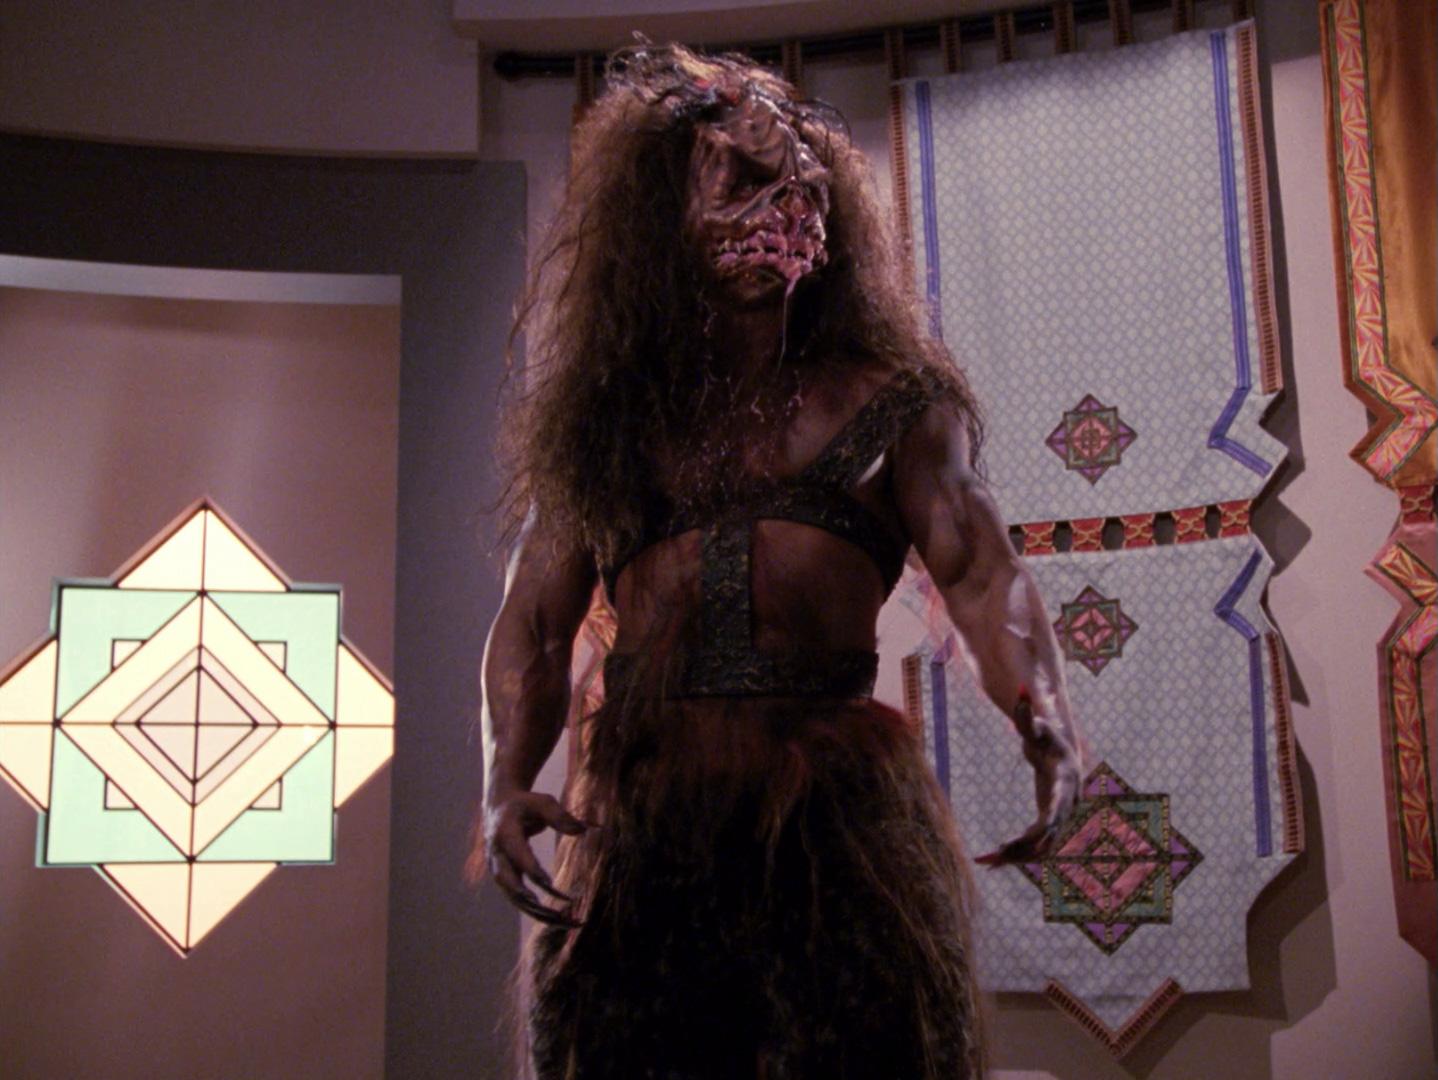 Star Trek: The Next Generation - Der Pakt mit dem Teufel (Devil's Due) Blu-ray Screencap © CBS/Paramount